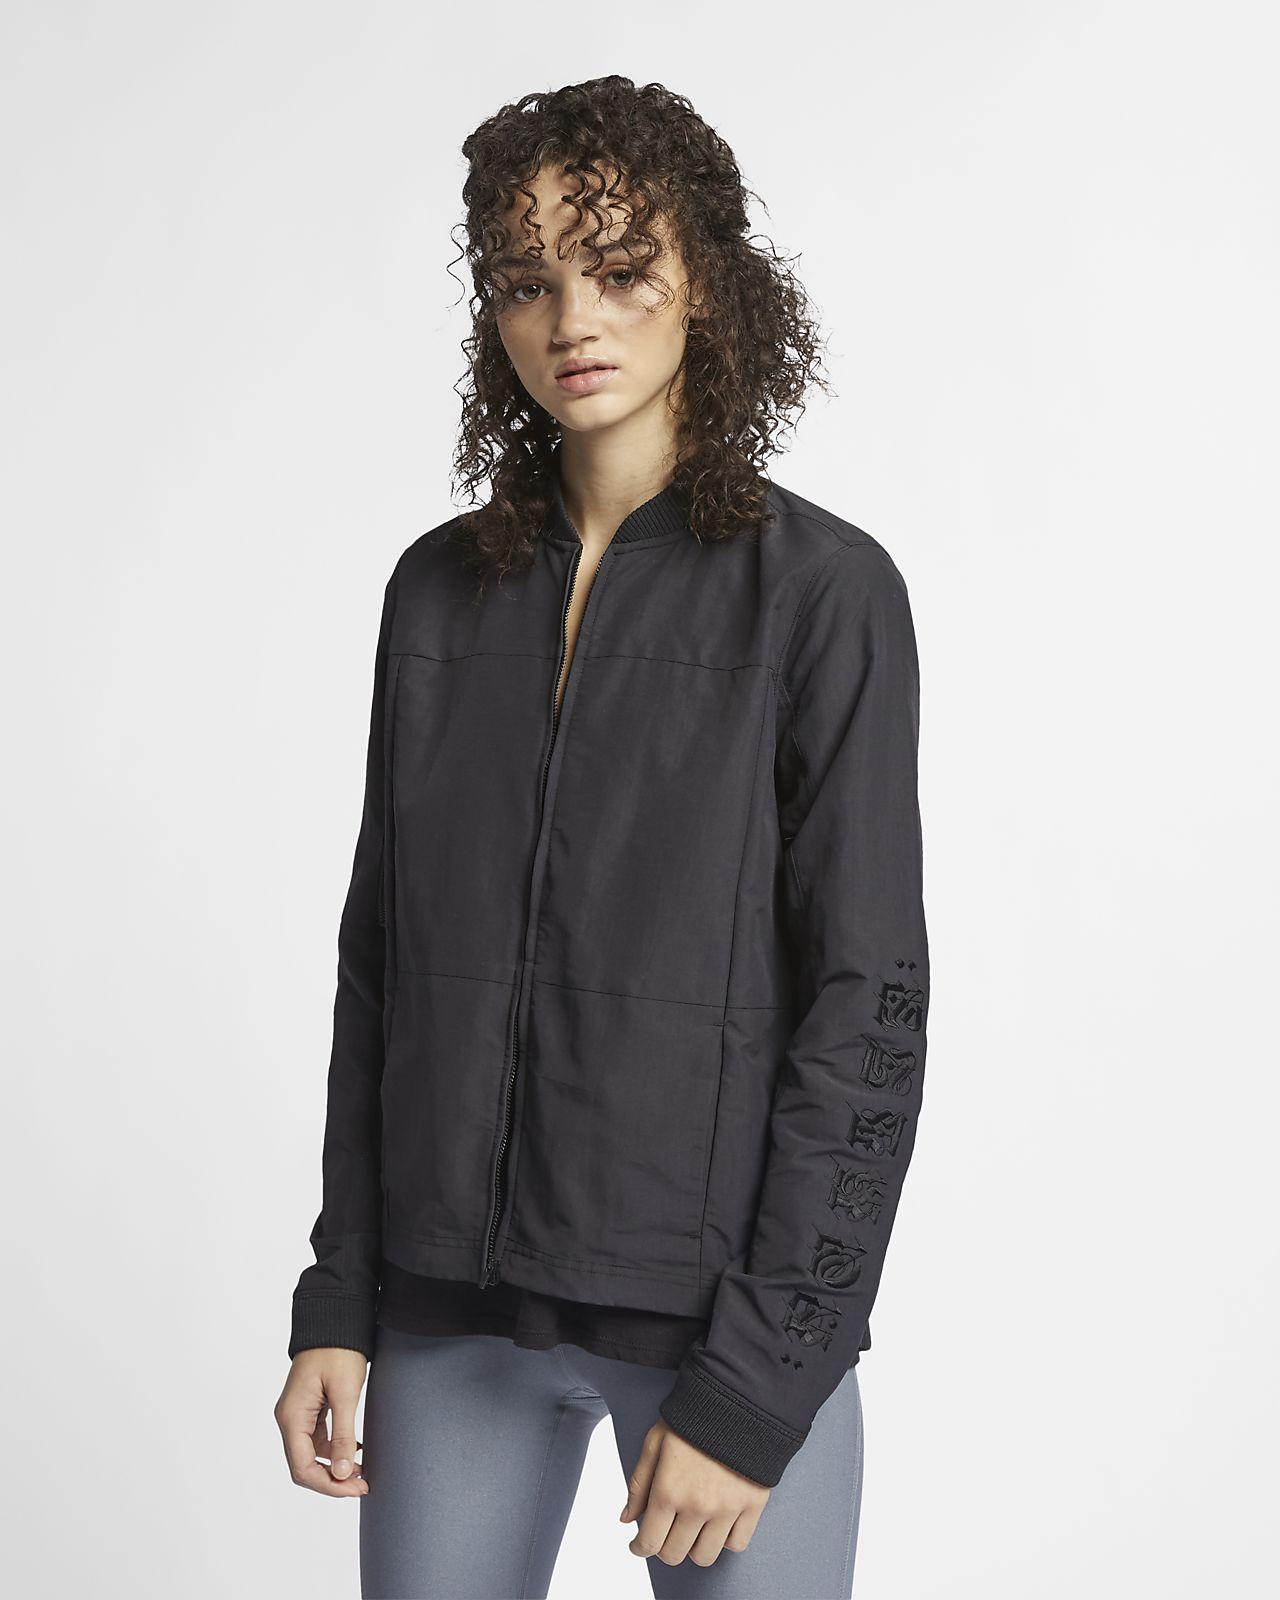 Hurley Cryptik Women's Bomber Jacket